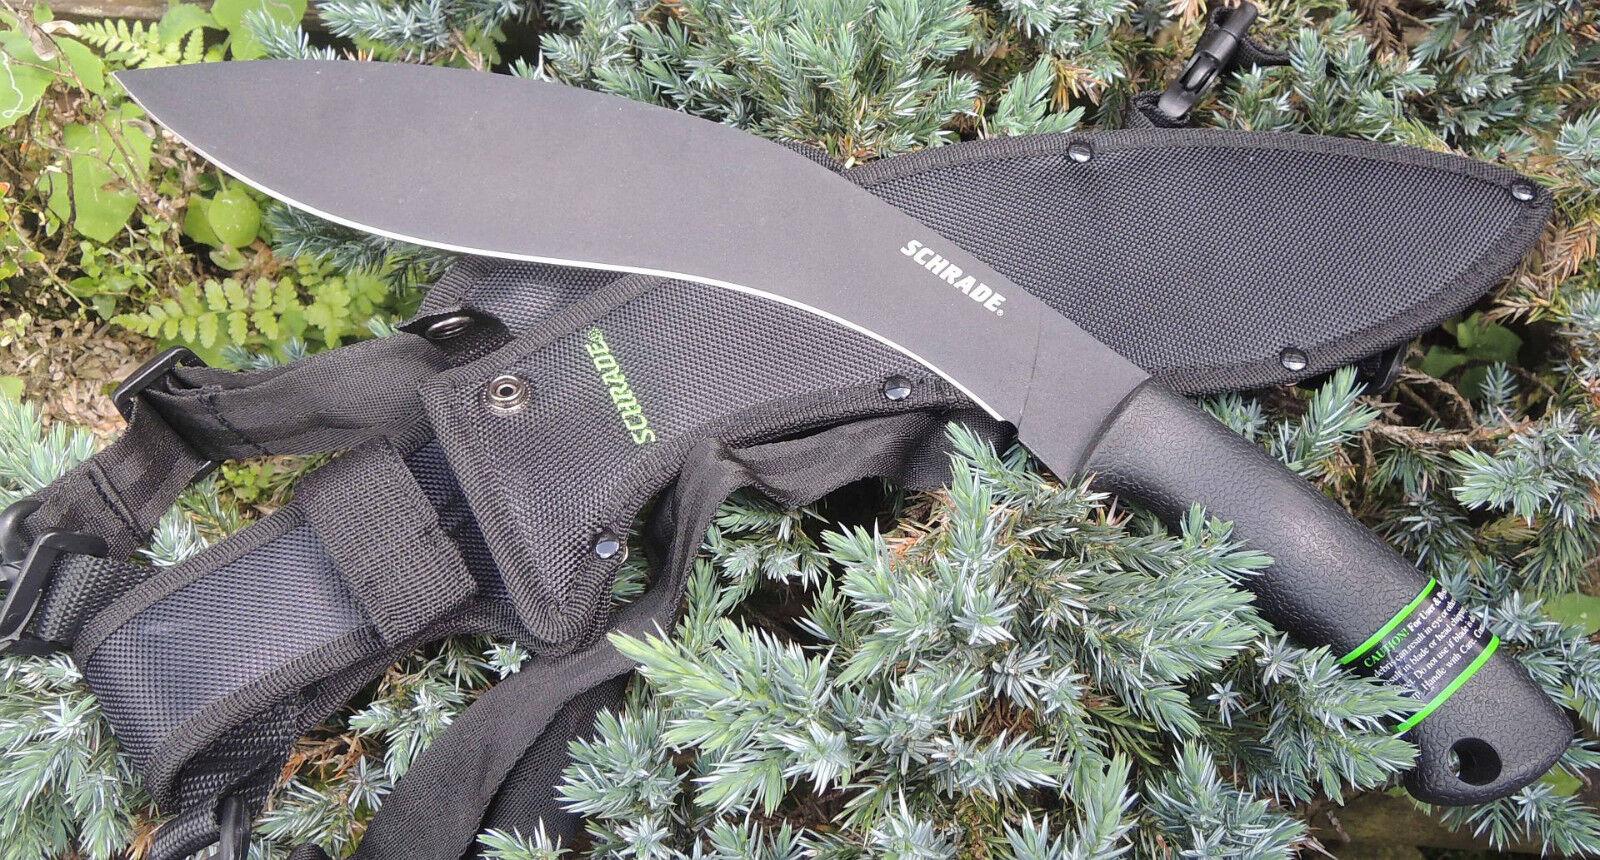 SCHRADE Messer Gurka Gurka Gurka Kukri Machete Buschmesser 3Cr13 Stahl + Scheide SCHGK1 da3ccf